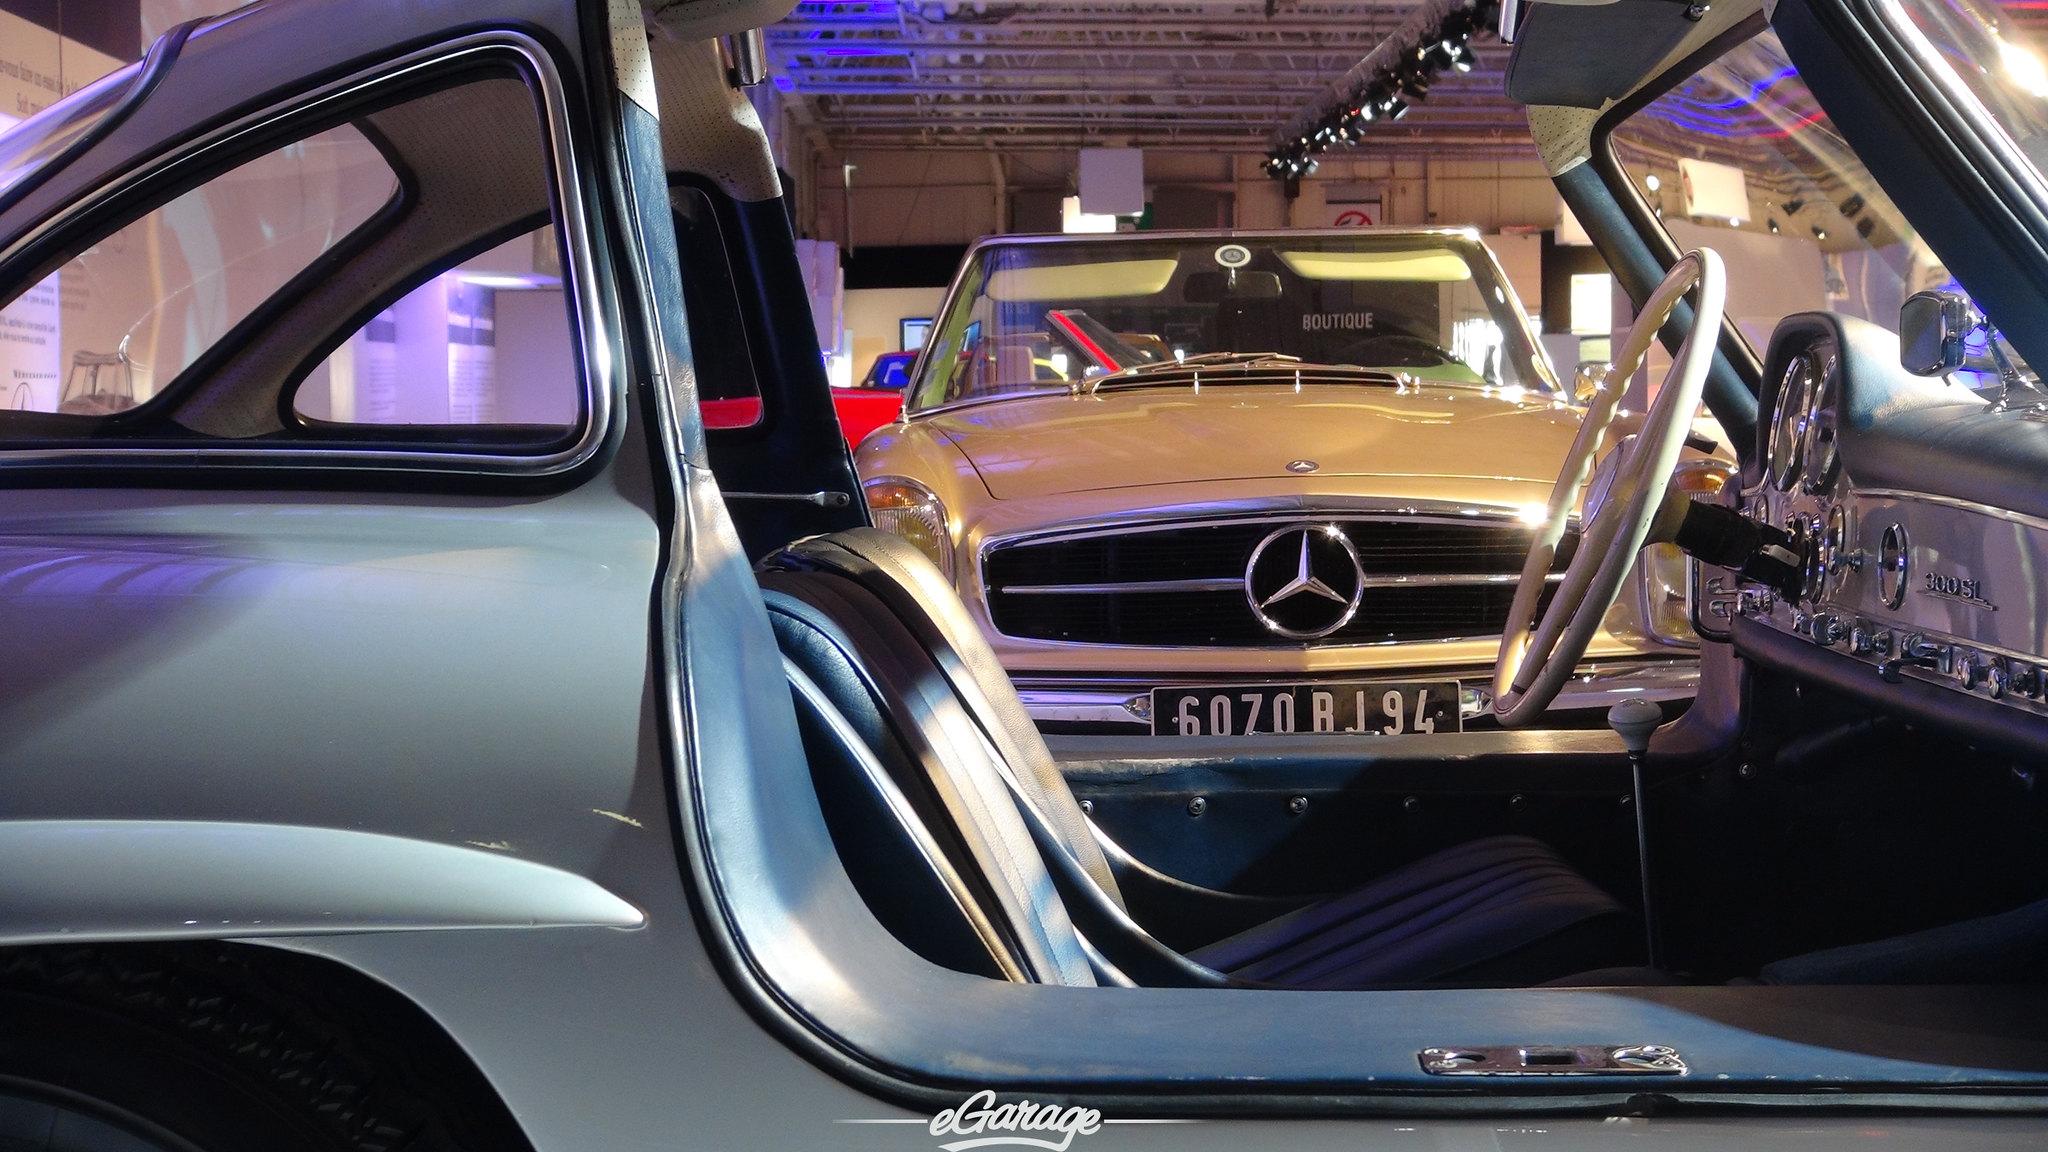 8037669872 f443fa5109 k 2012 Paris Motor Show